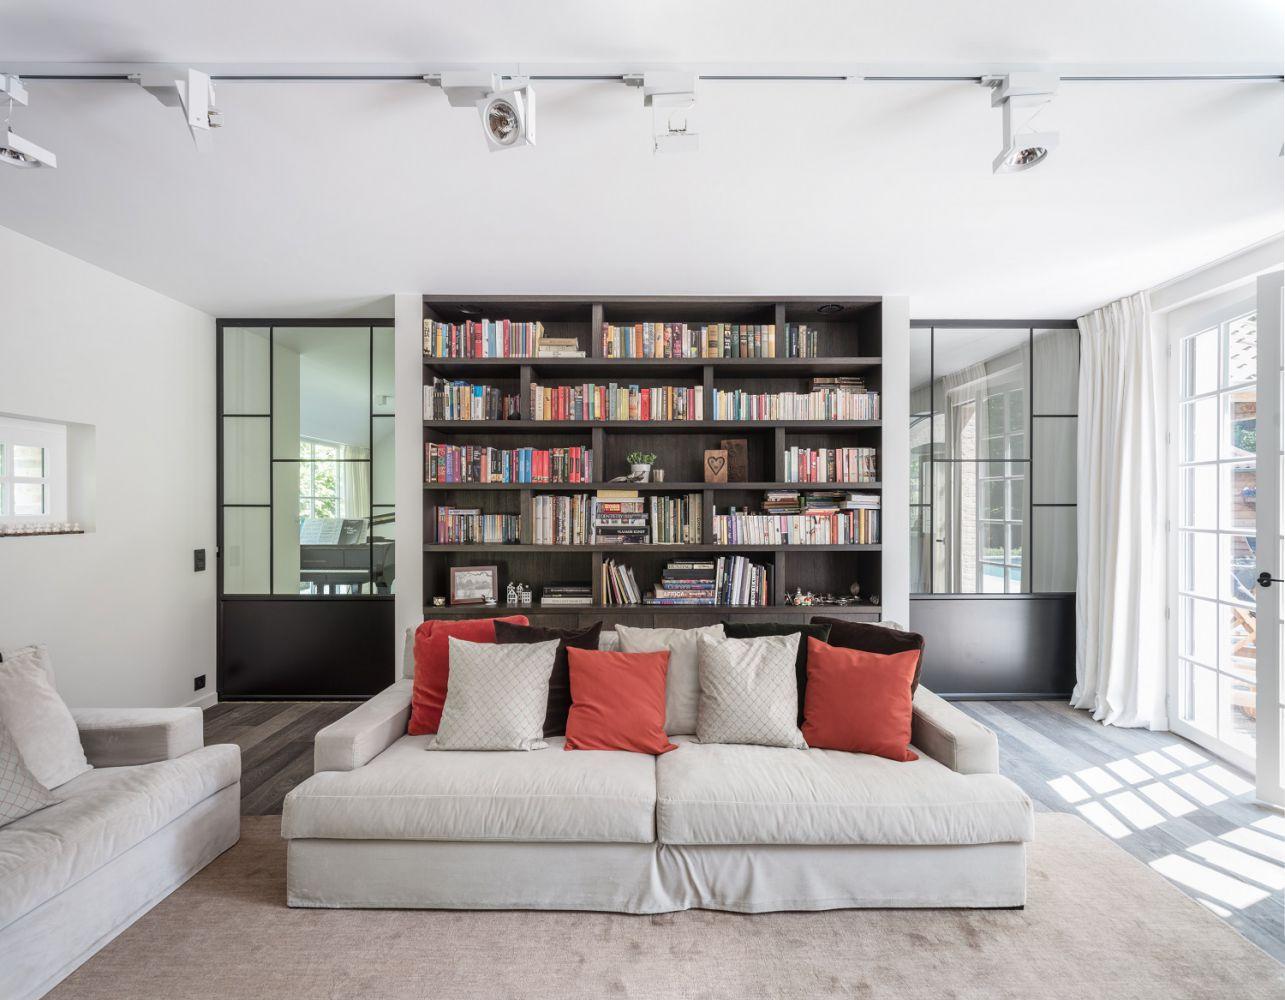 Interieur villabouw vlassak verhulst exclusieve villabouw